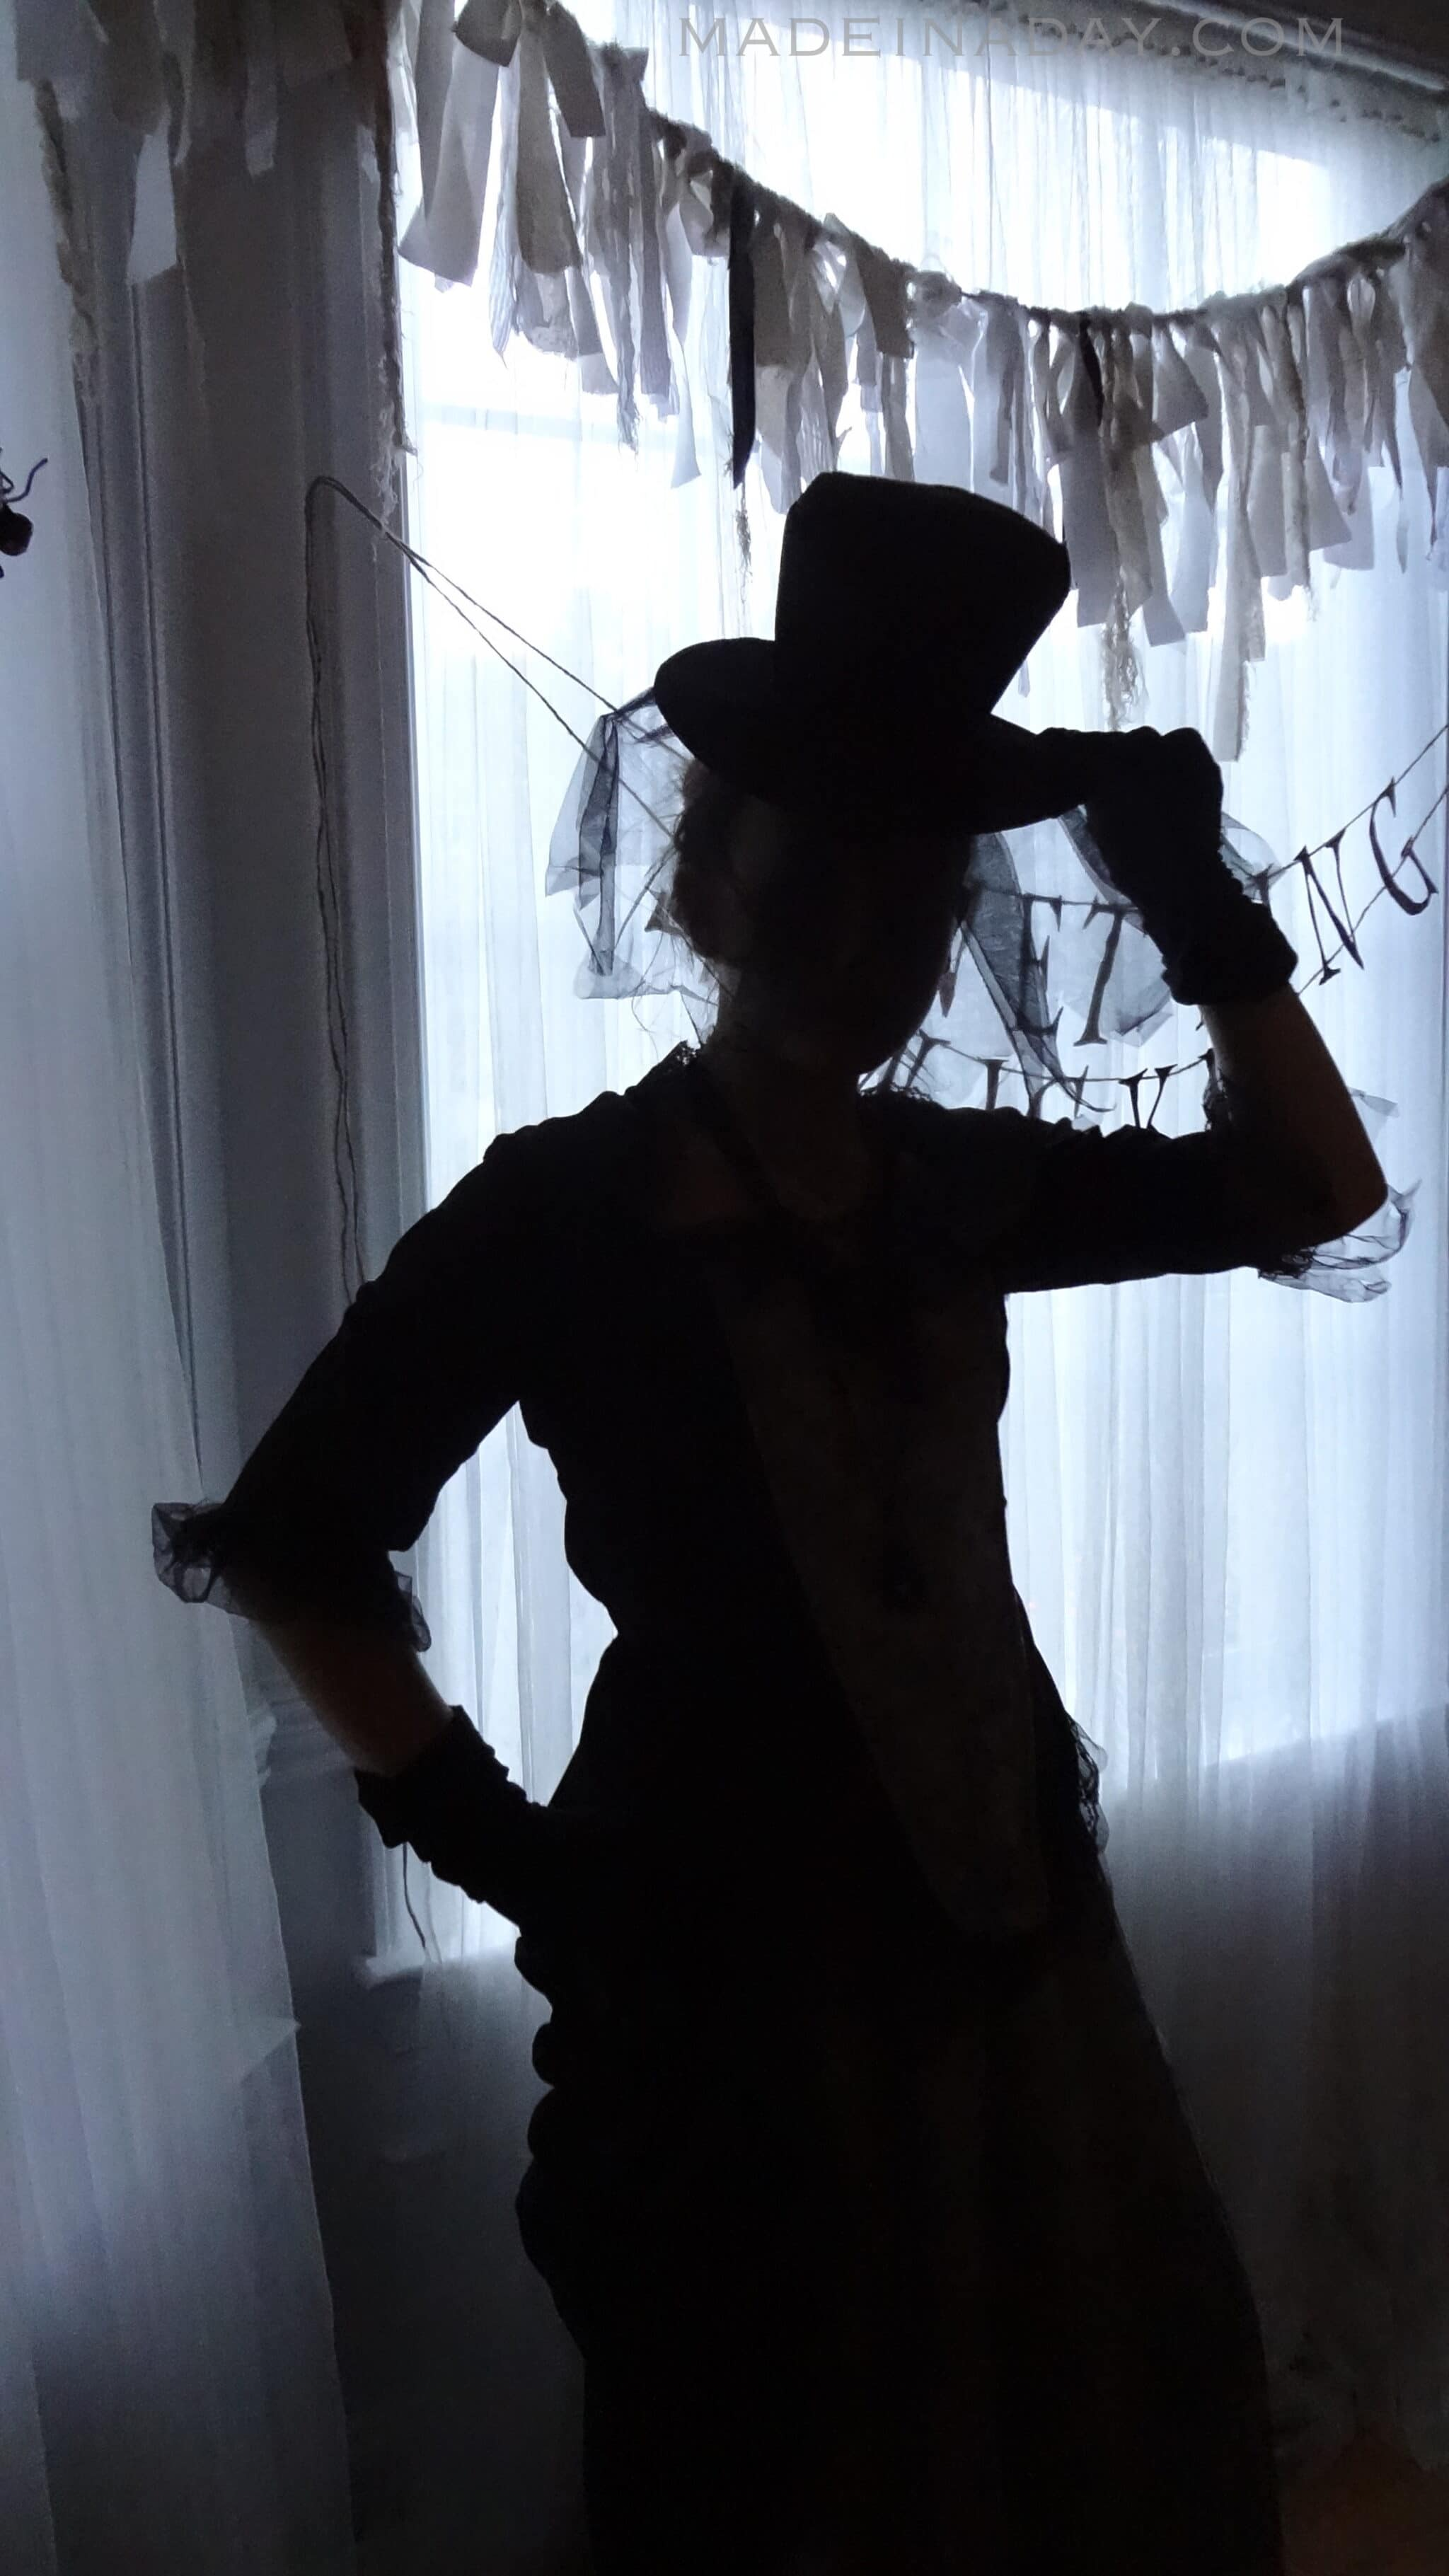 Spooky Silhouette Halloween Costume madeinaday.com